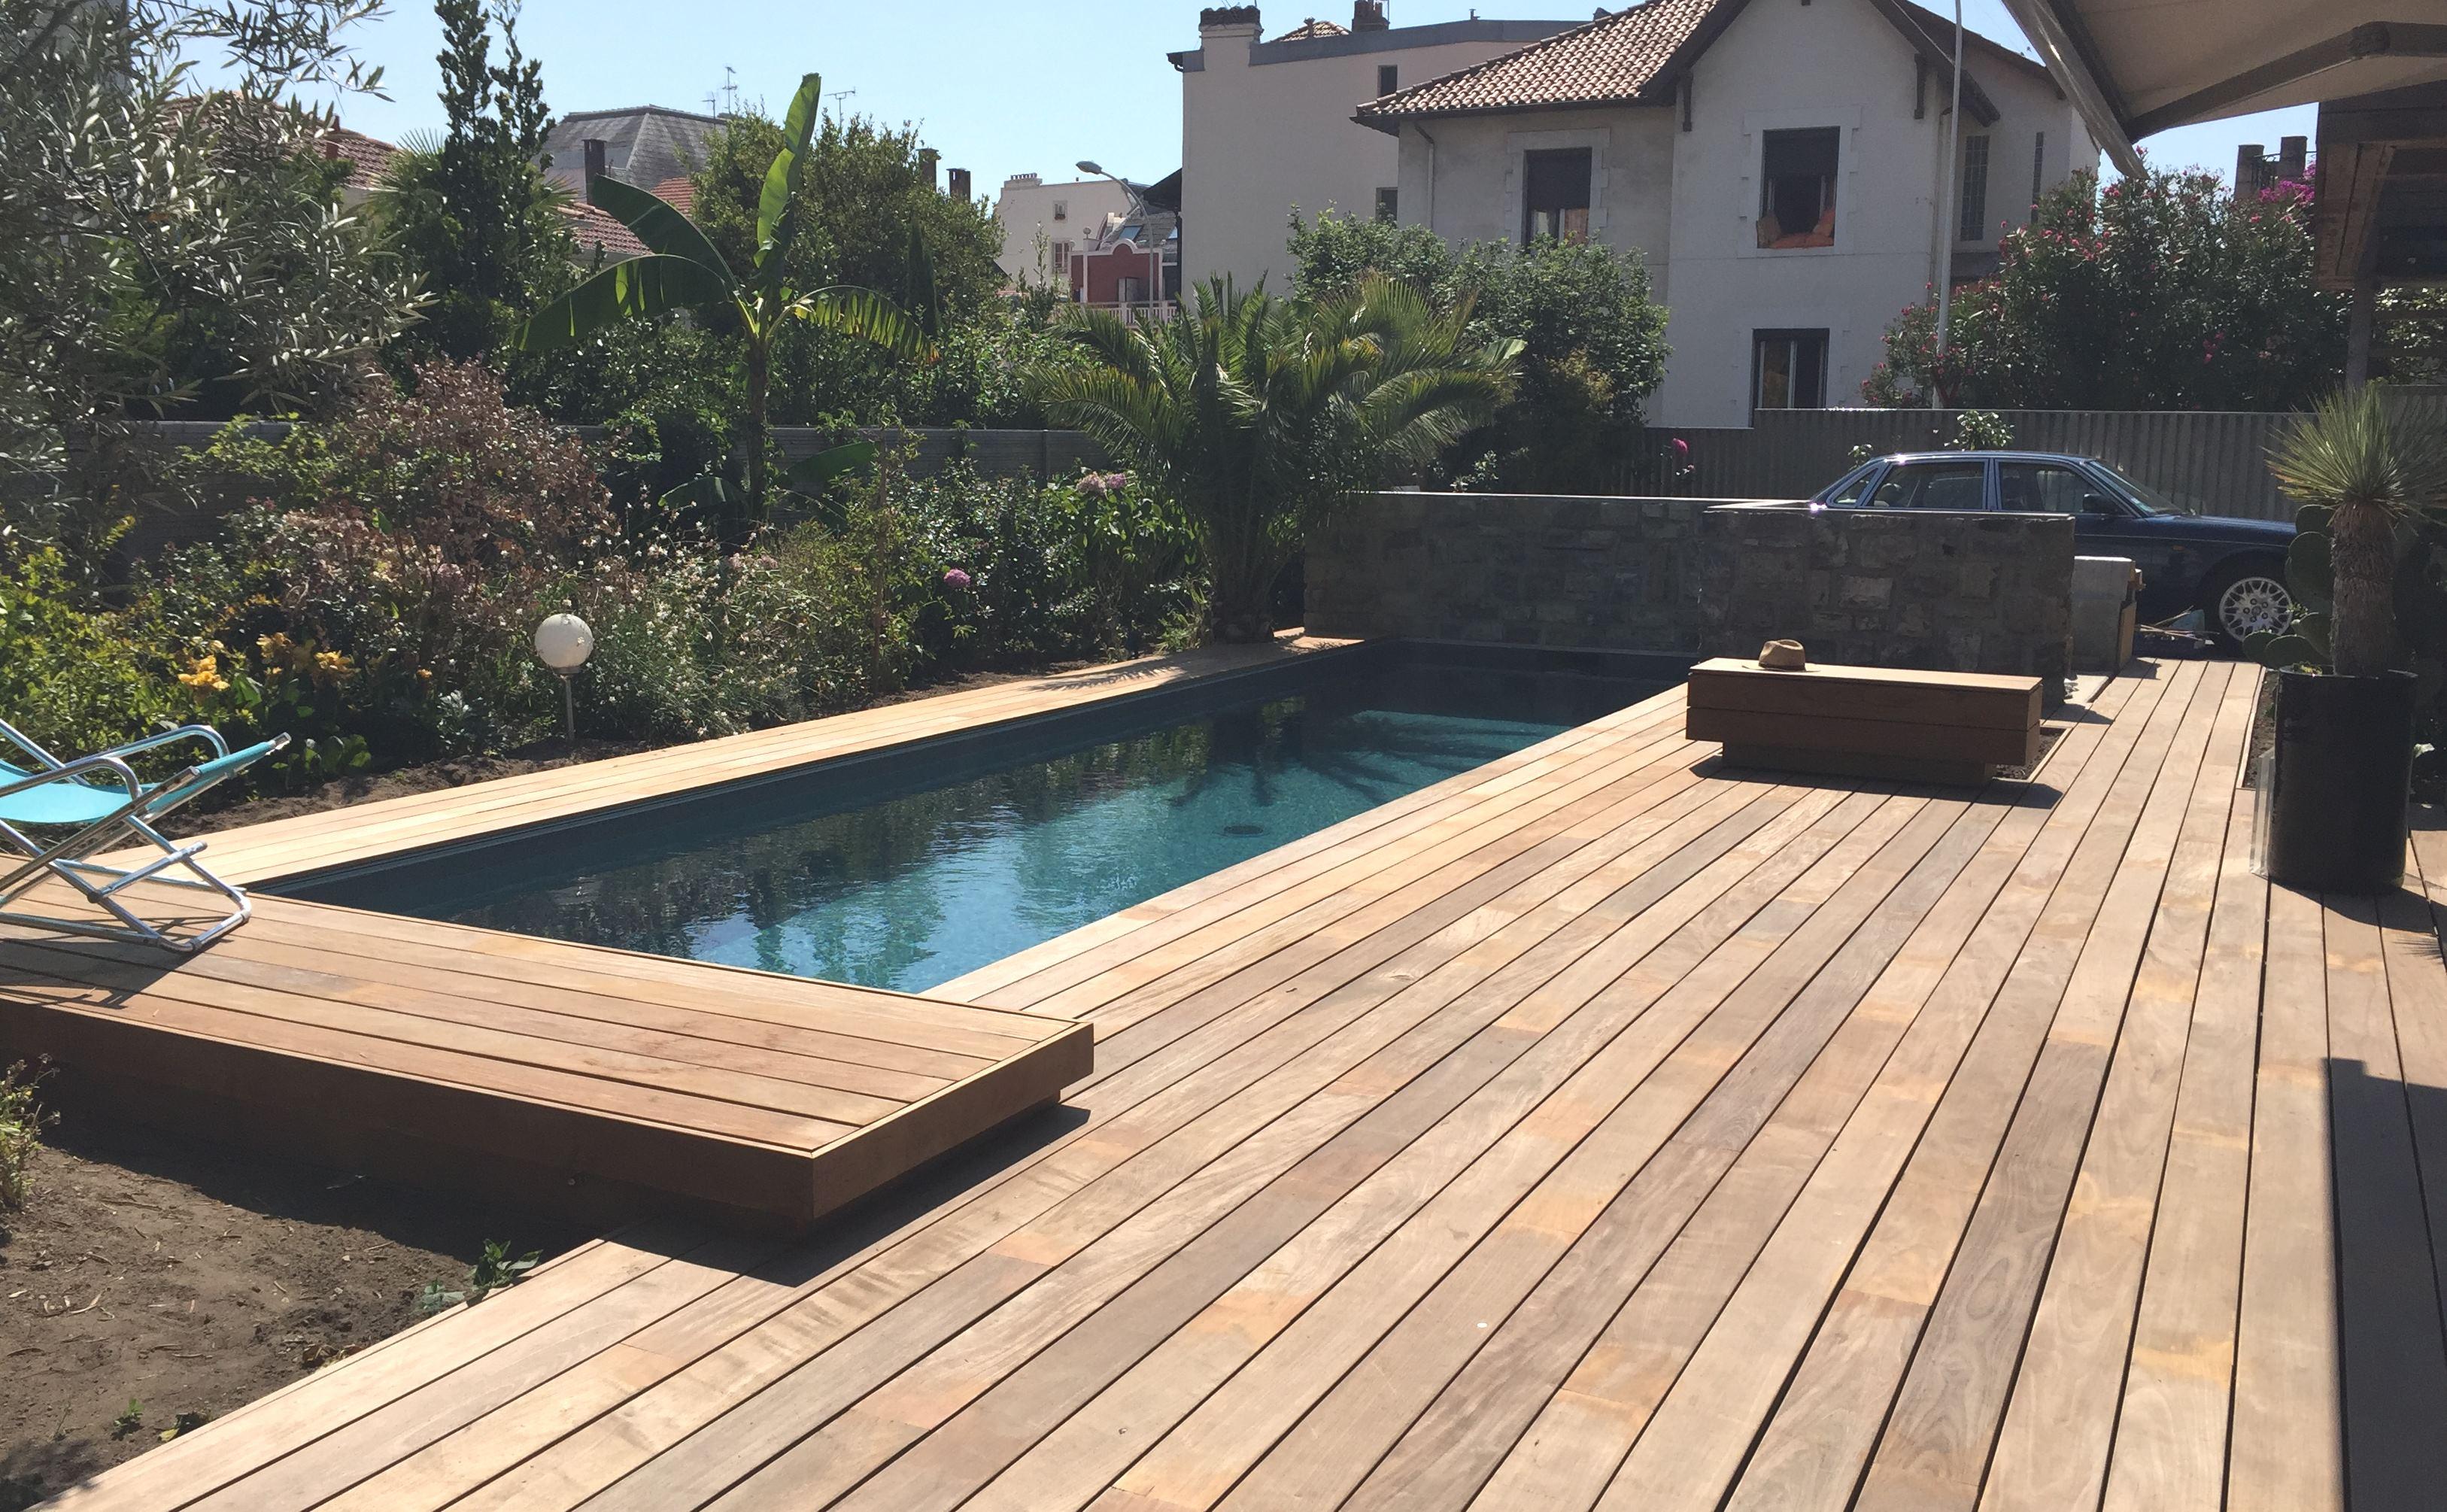 cr ations bois darrieumerlou terrasse bois exotique ip. Black Bedroom Furniture Sets. Home Design Ideas